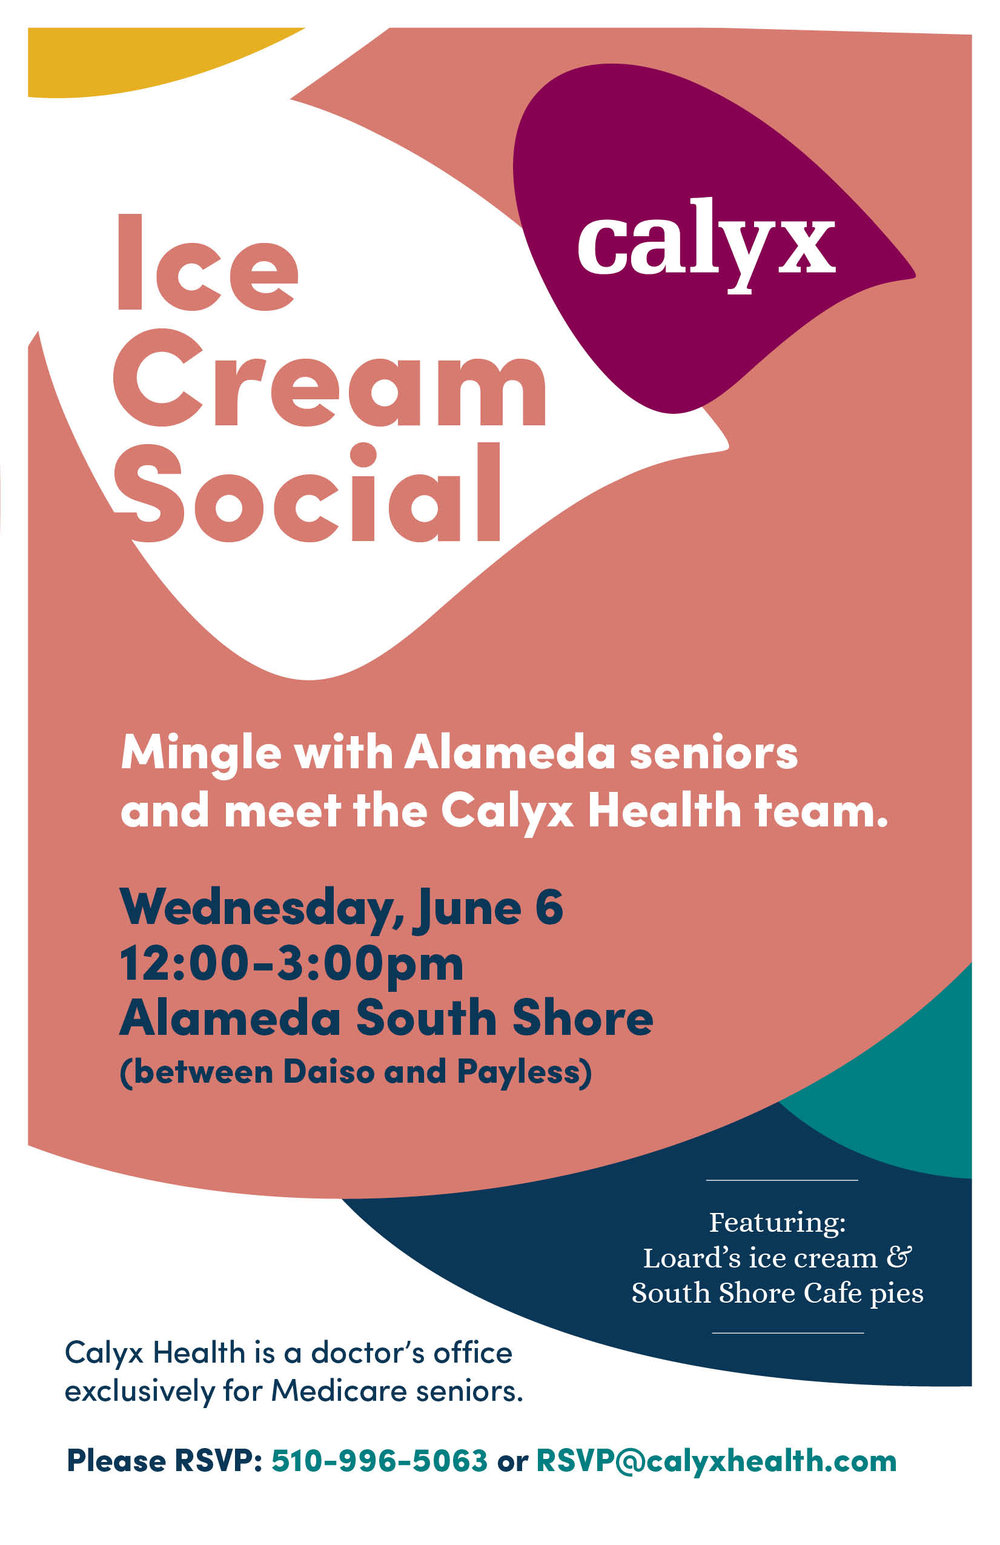 Calyx Health_Ice Cream Social_June 6.jpg